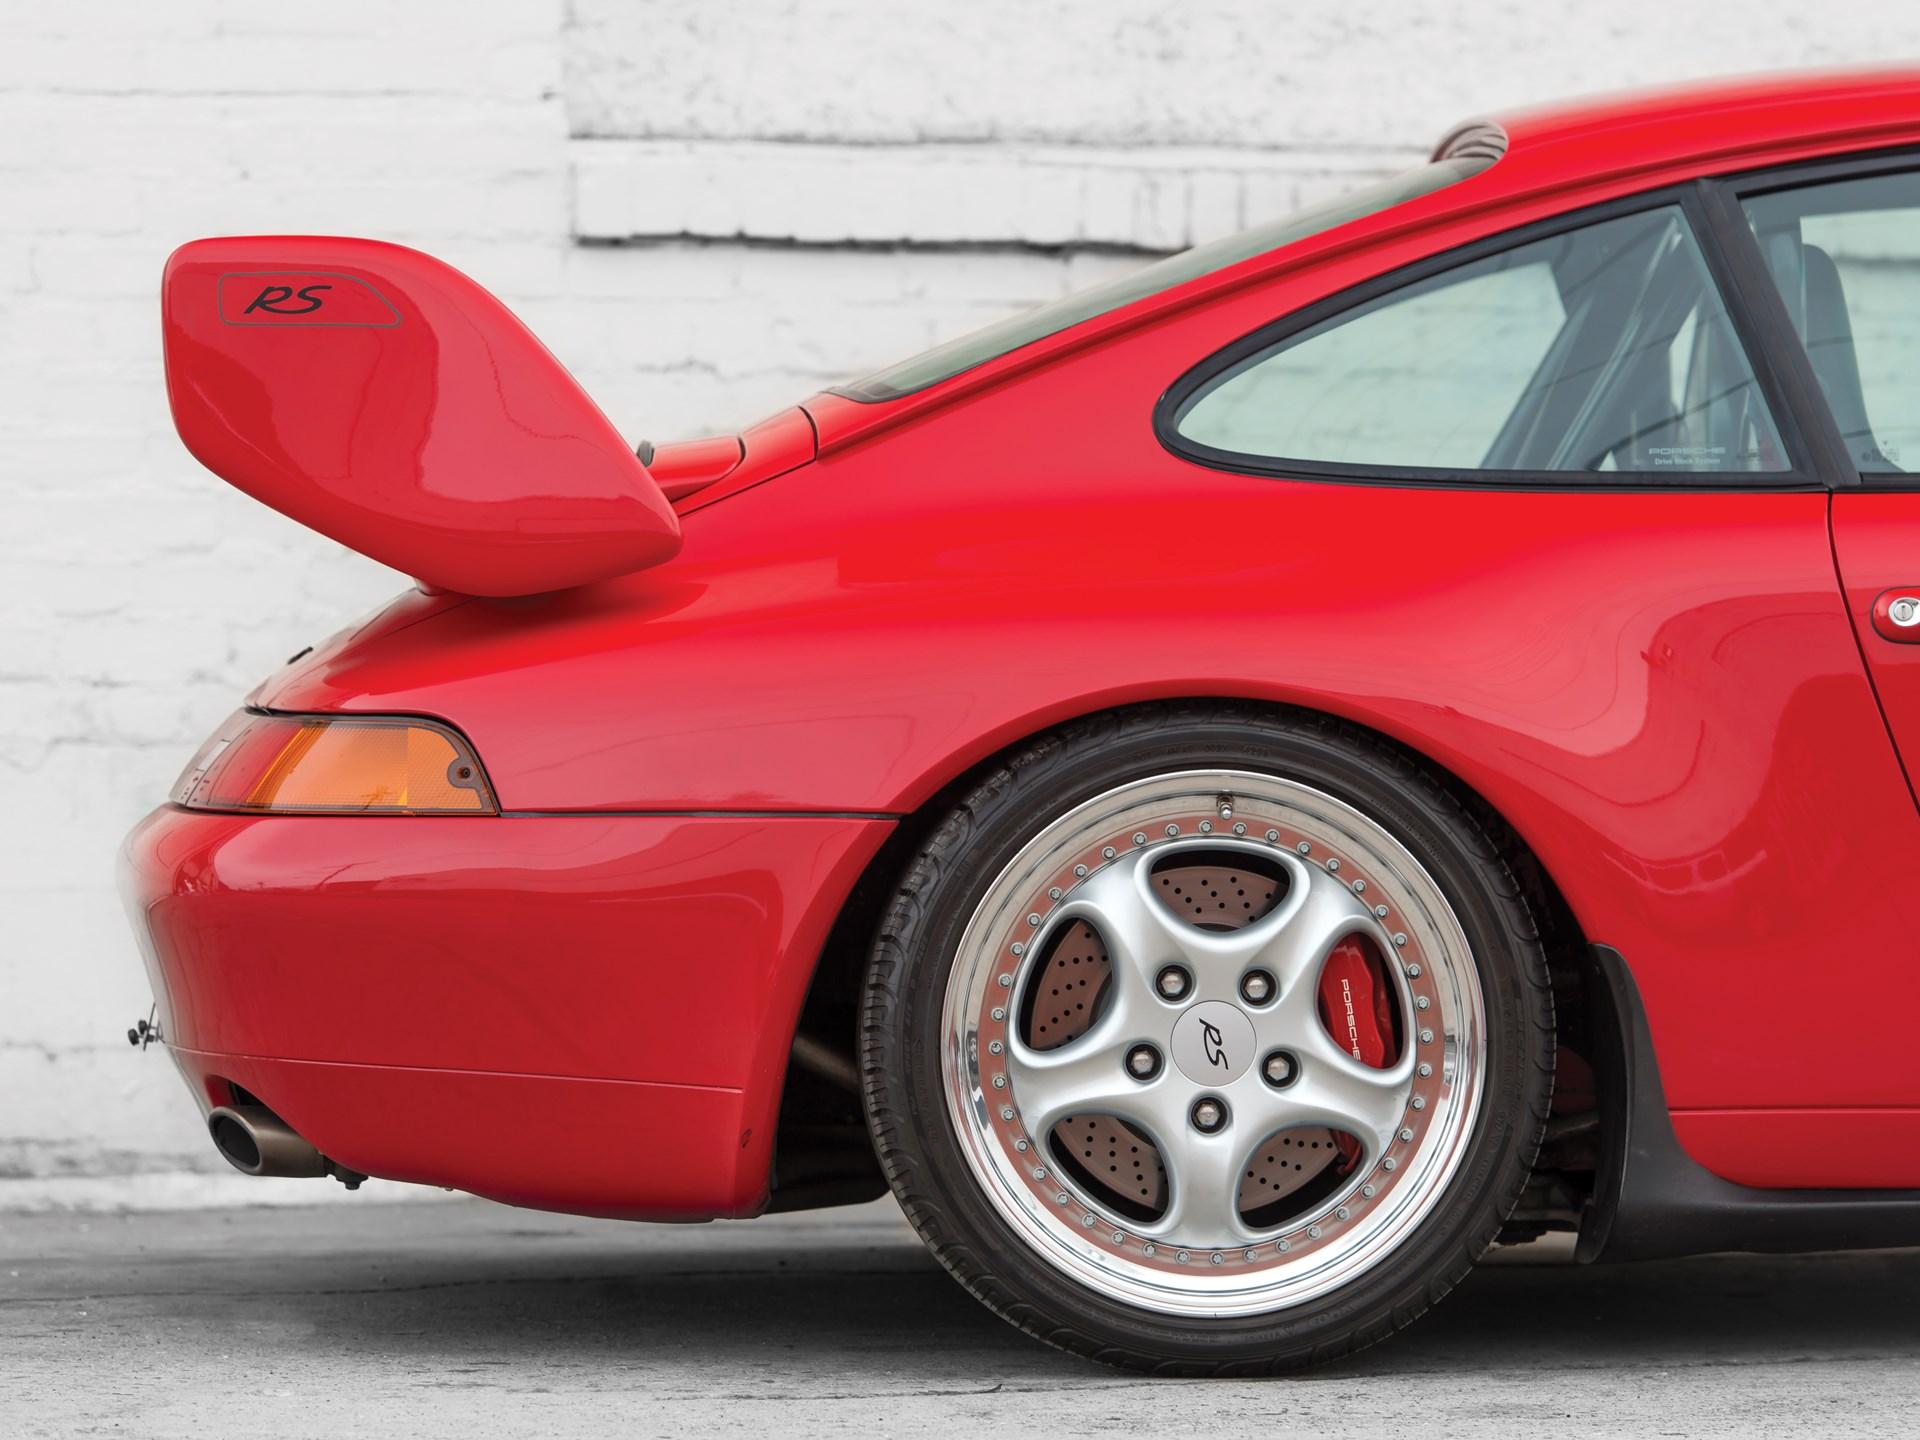 1995 Porsche 911 Carrera RS 3.8